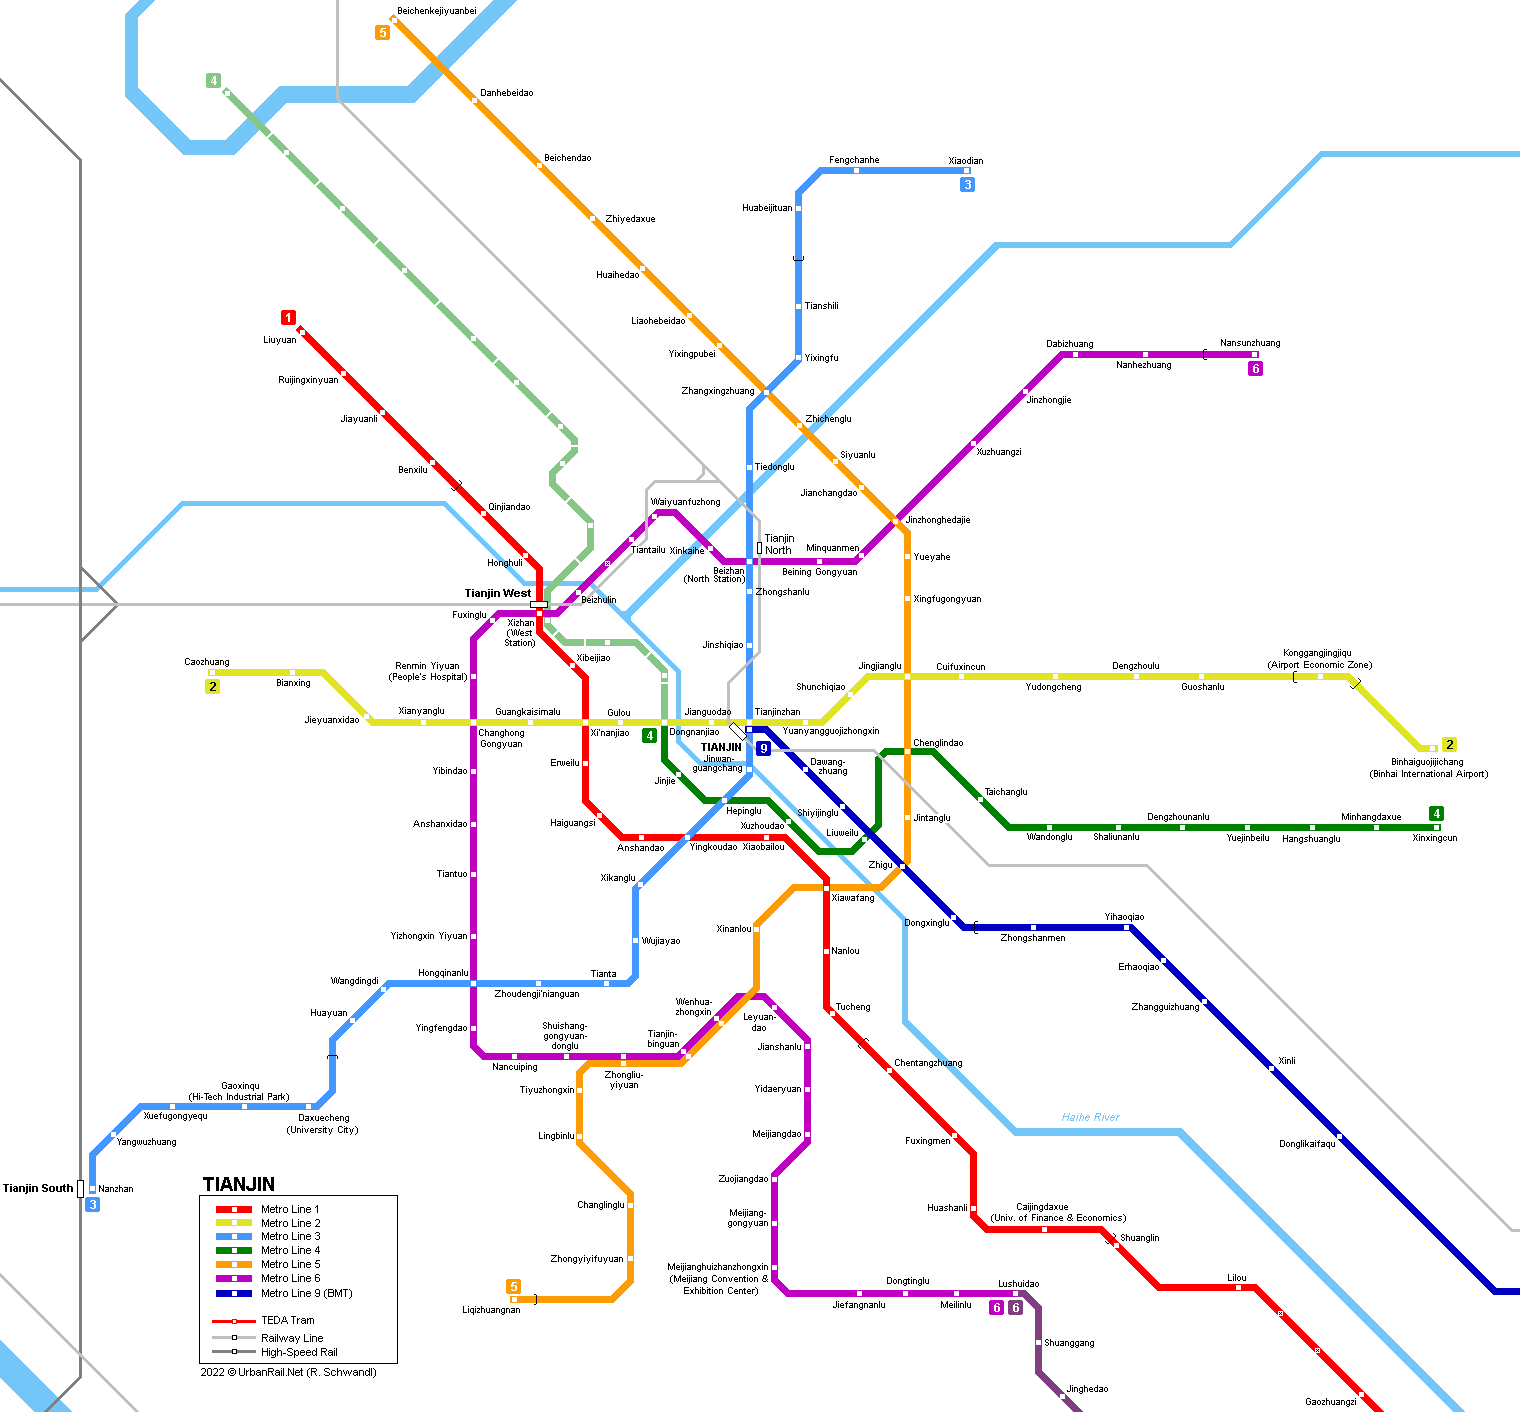 Bejing Subway Map 2018.Urbanrail Net Asia China Tianjin Tientsin Subway